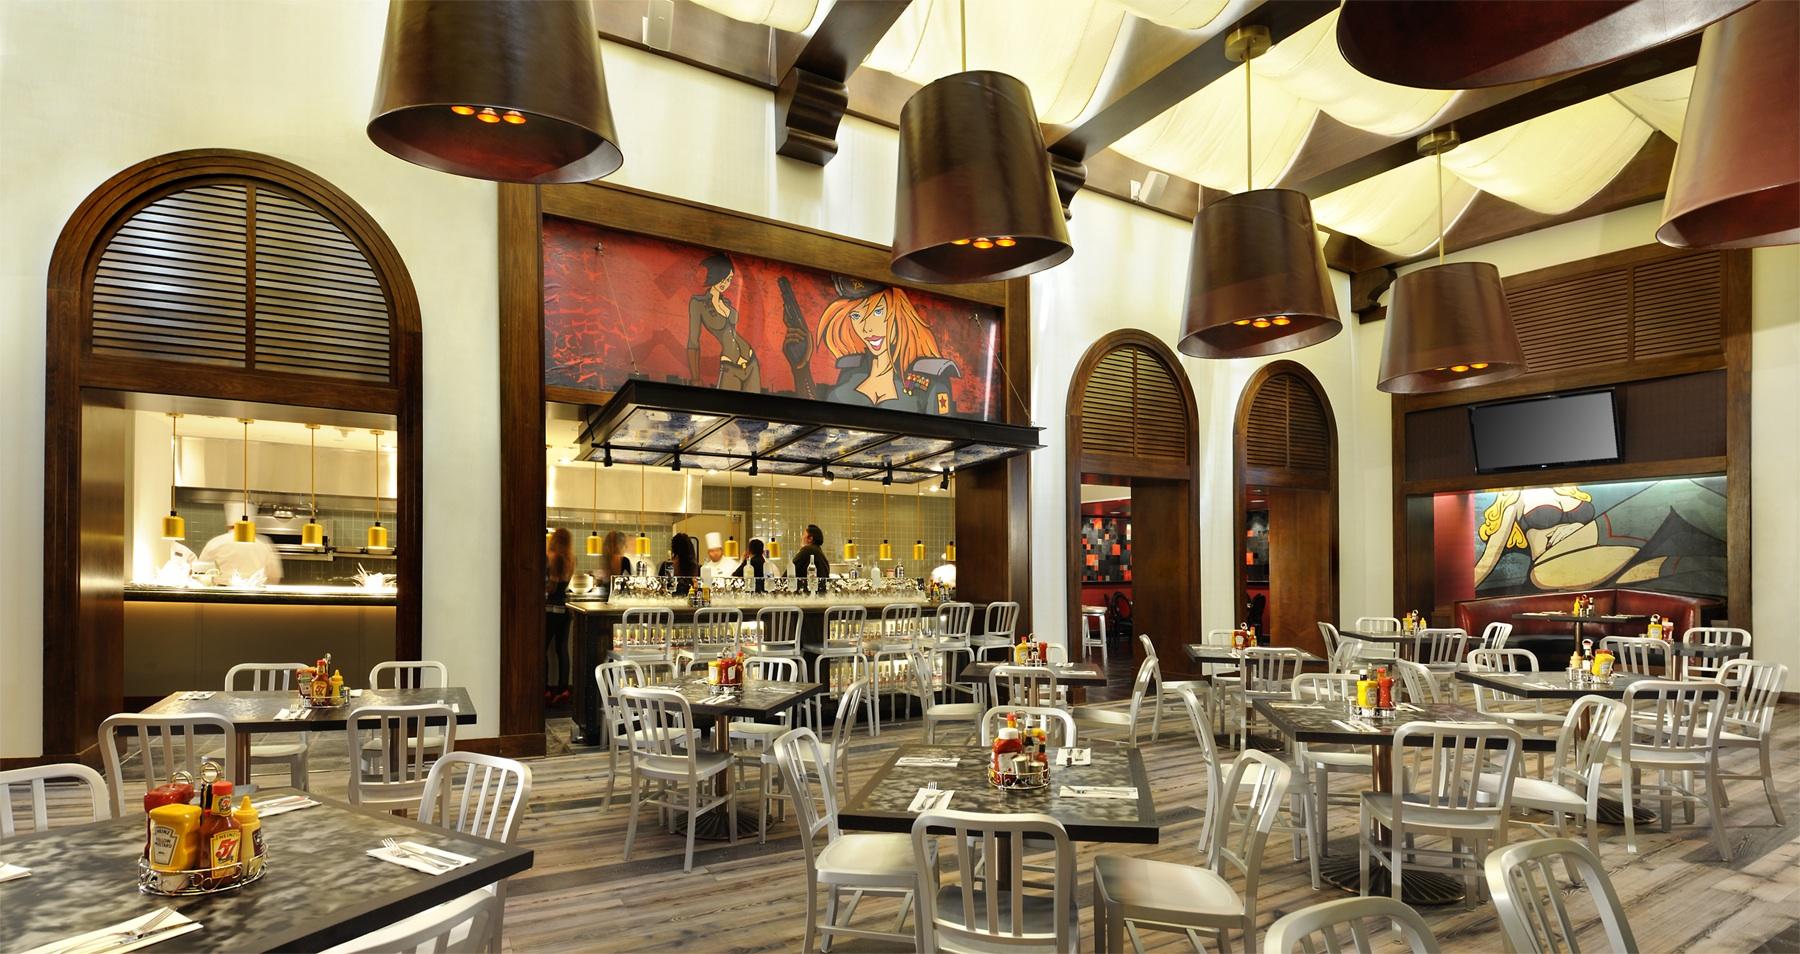 HLV_KGB_Kerry_s_Gourmet_Burgers_Dining_Room%204-15-13.jpg